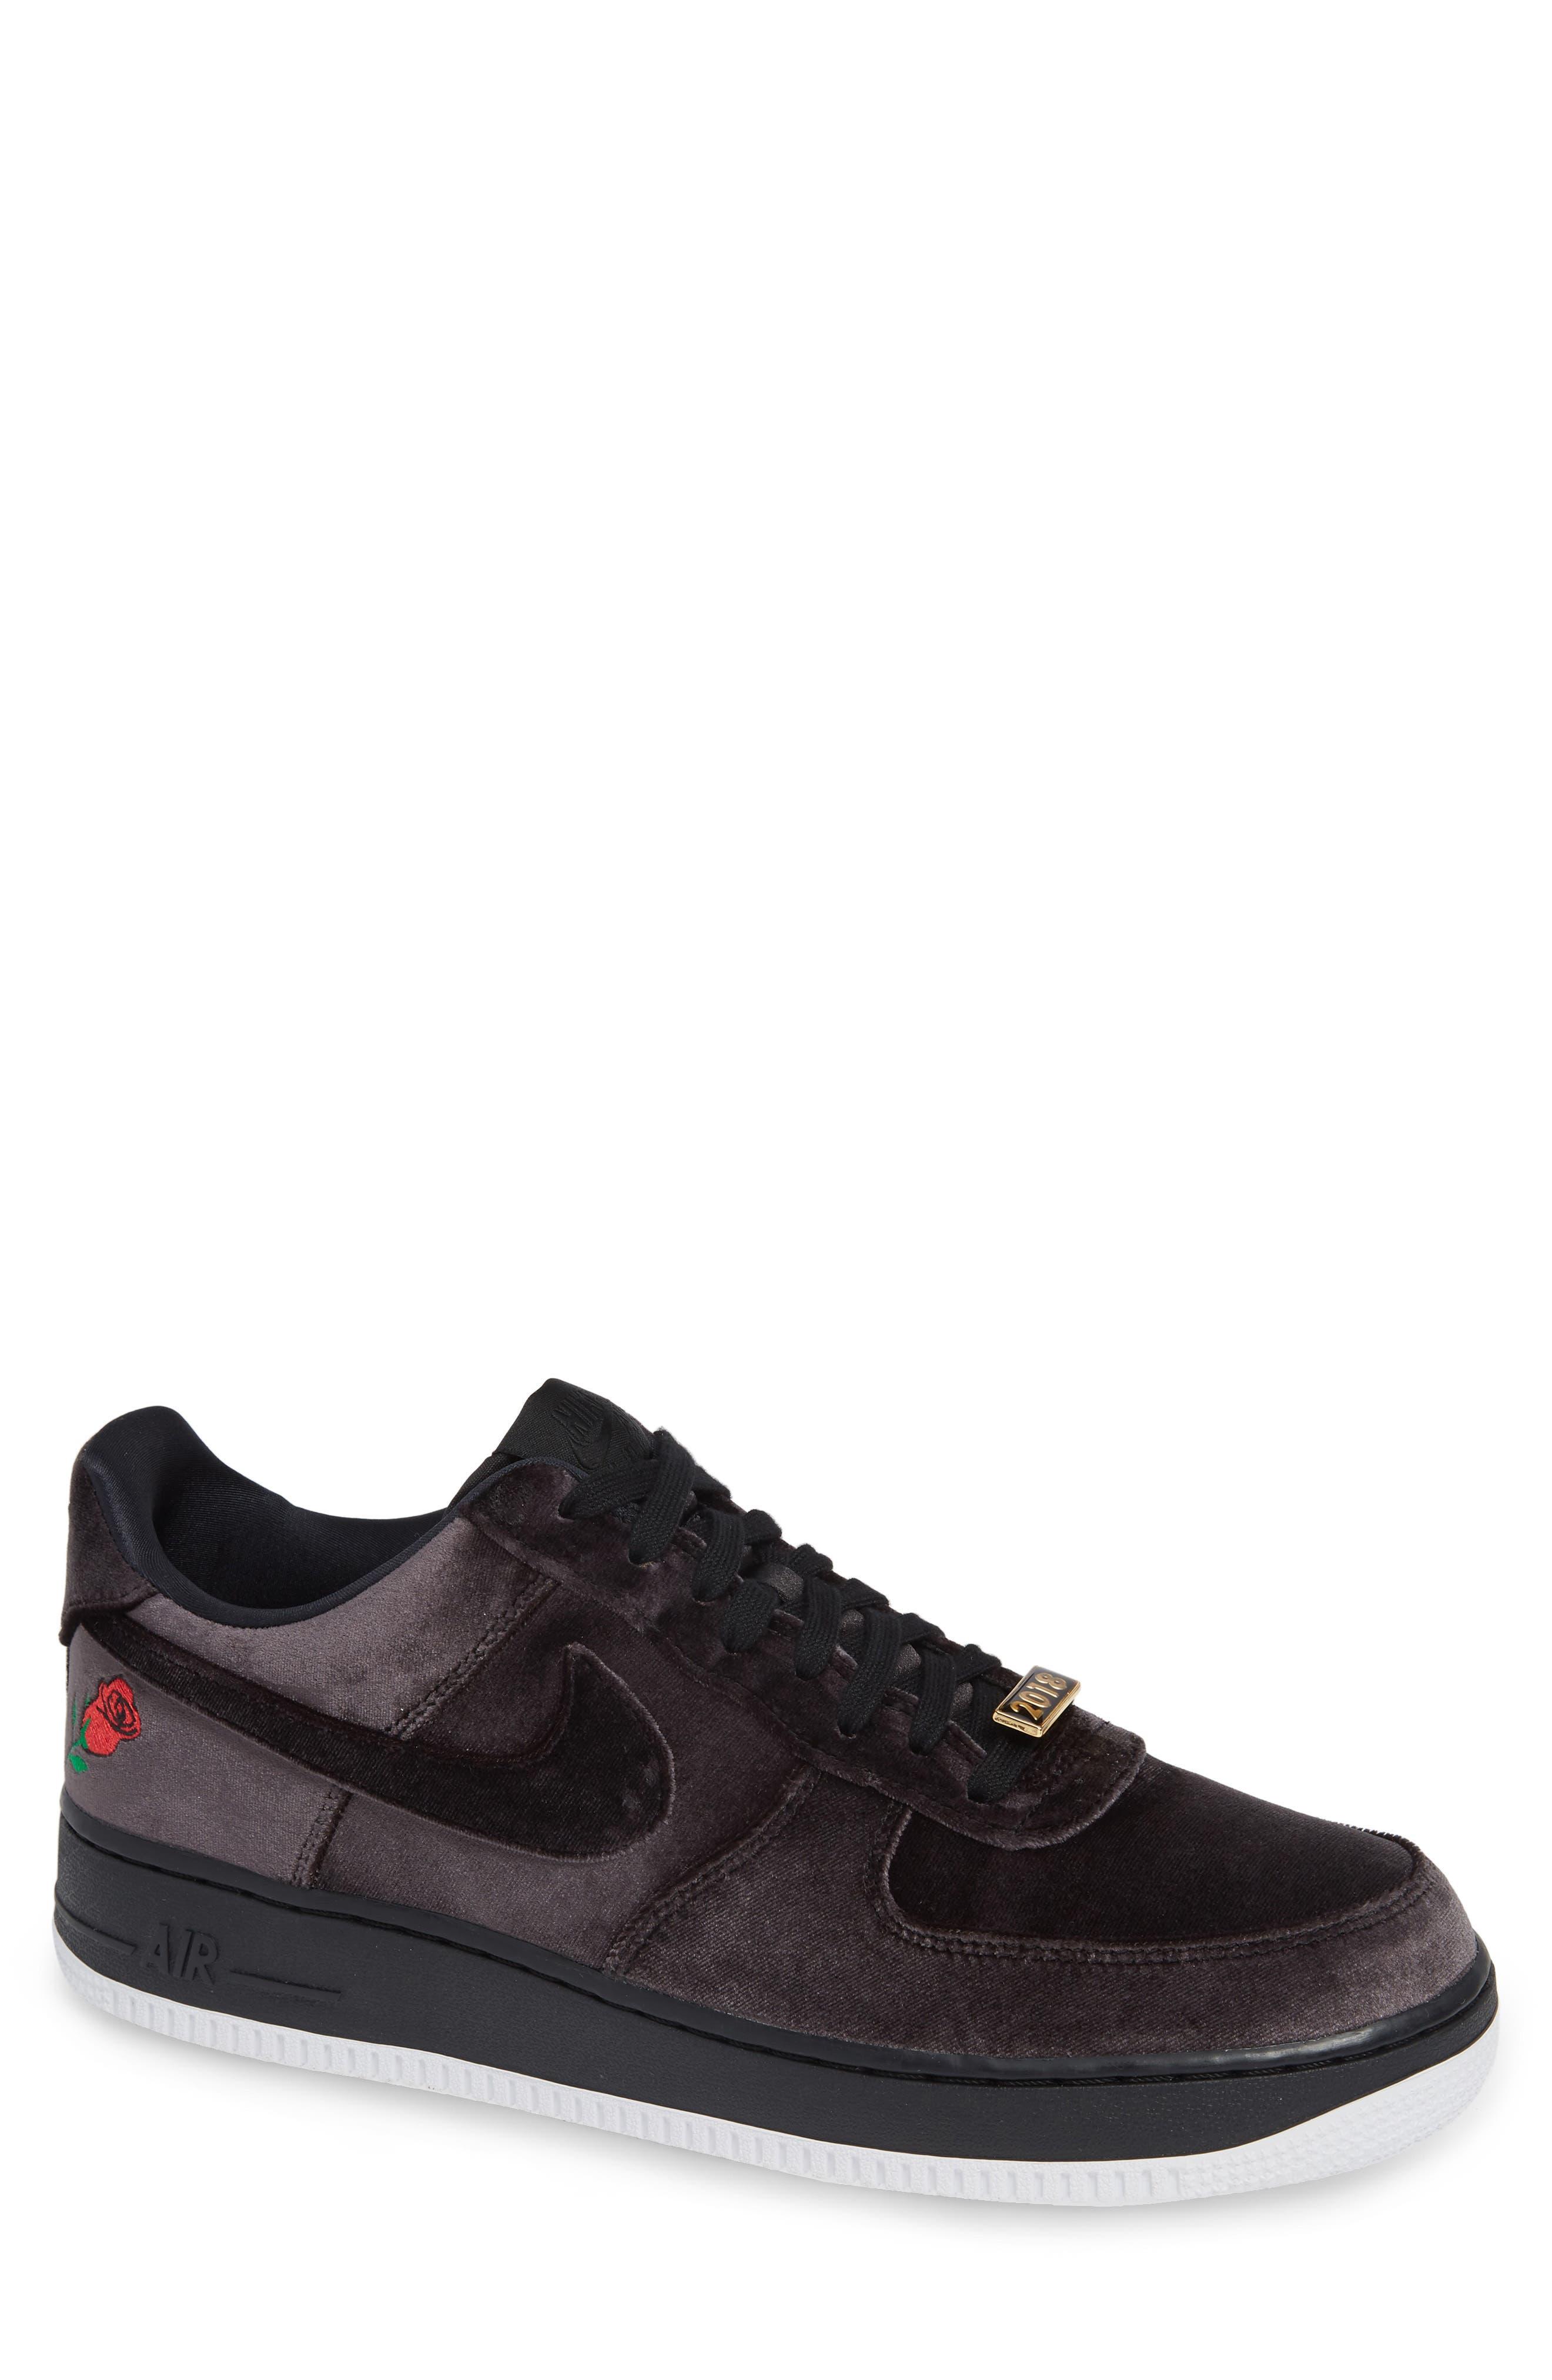 Air Force 1 '07 QS Sneaker,                             Main thumbnail 1, color,                             BLACK/ BLACK/ WHITE